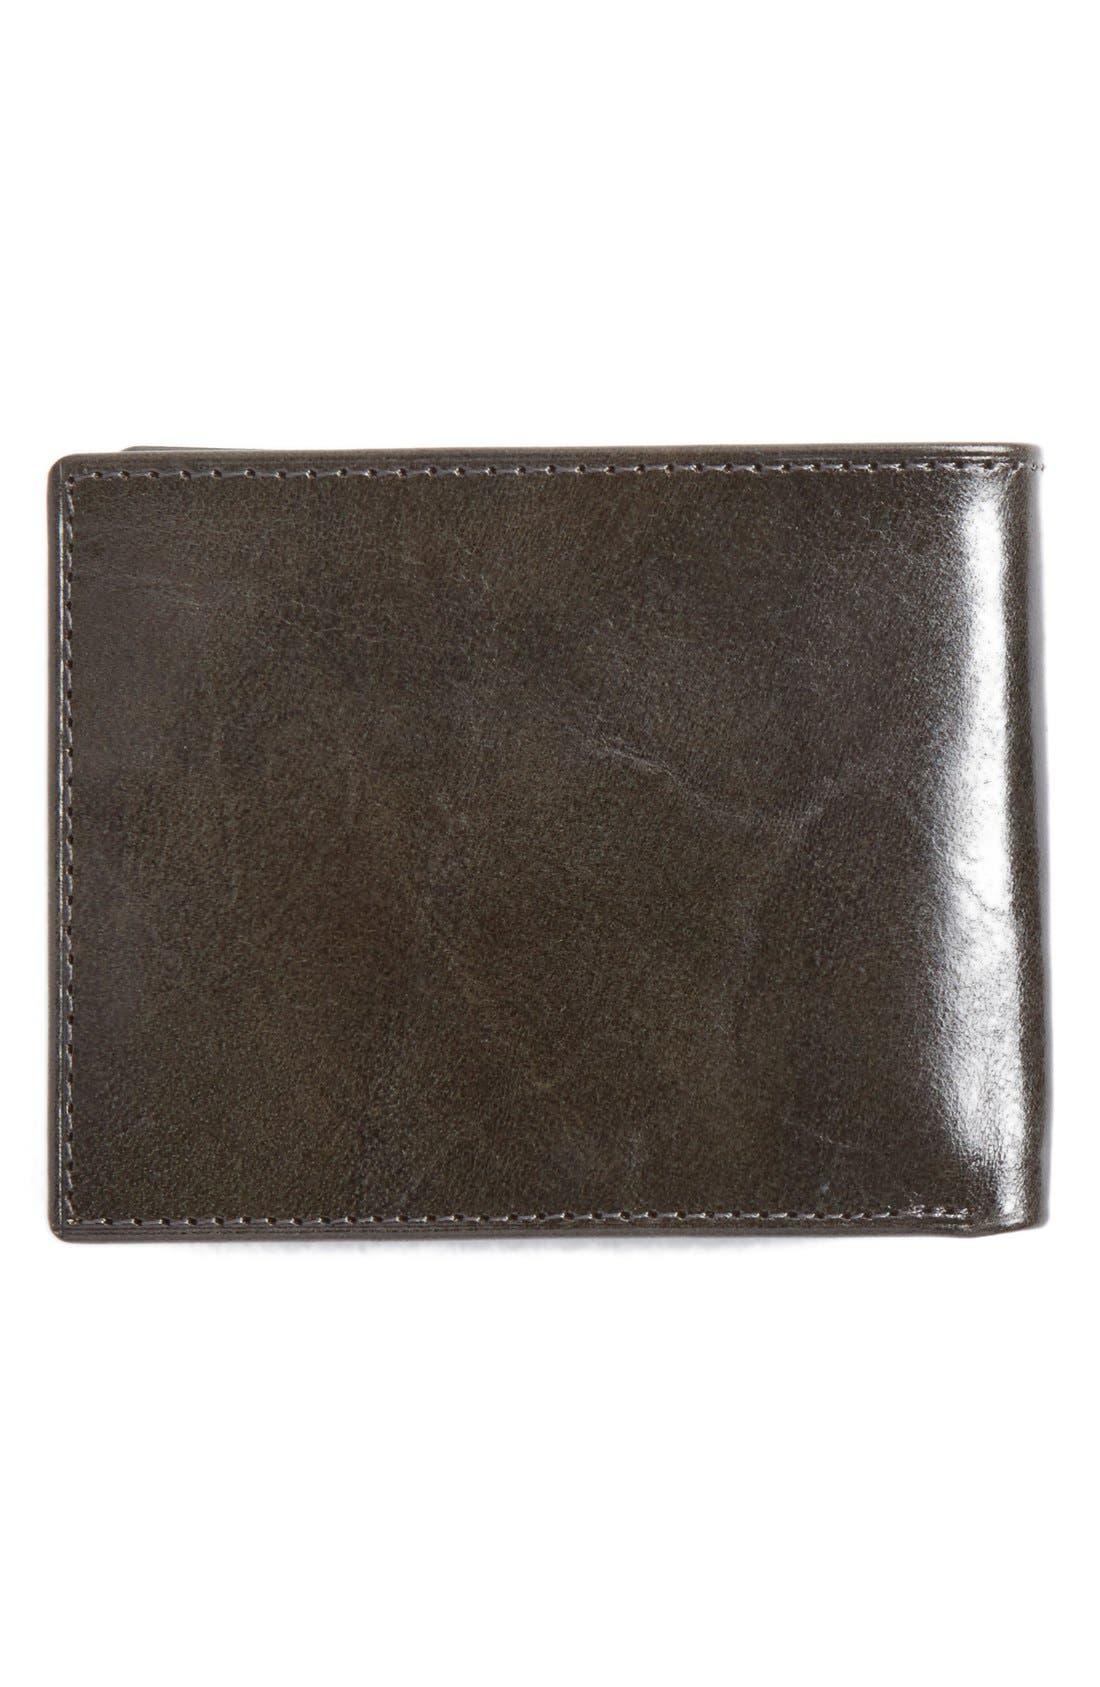 Flip Billfold Leather Wallet,                             Alternate thumbnail 4, color,                             Charcoal